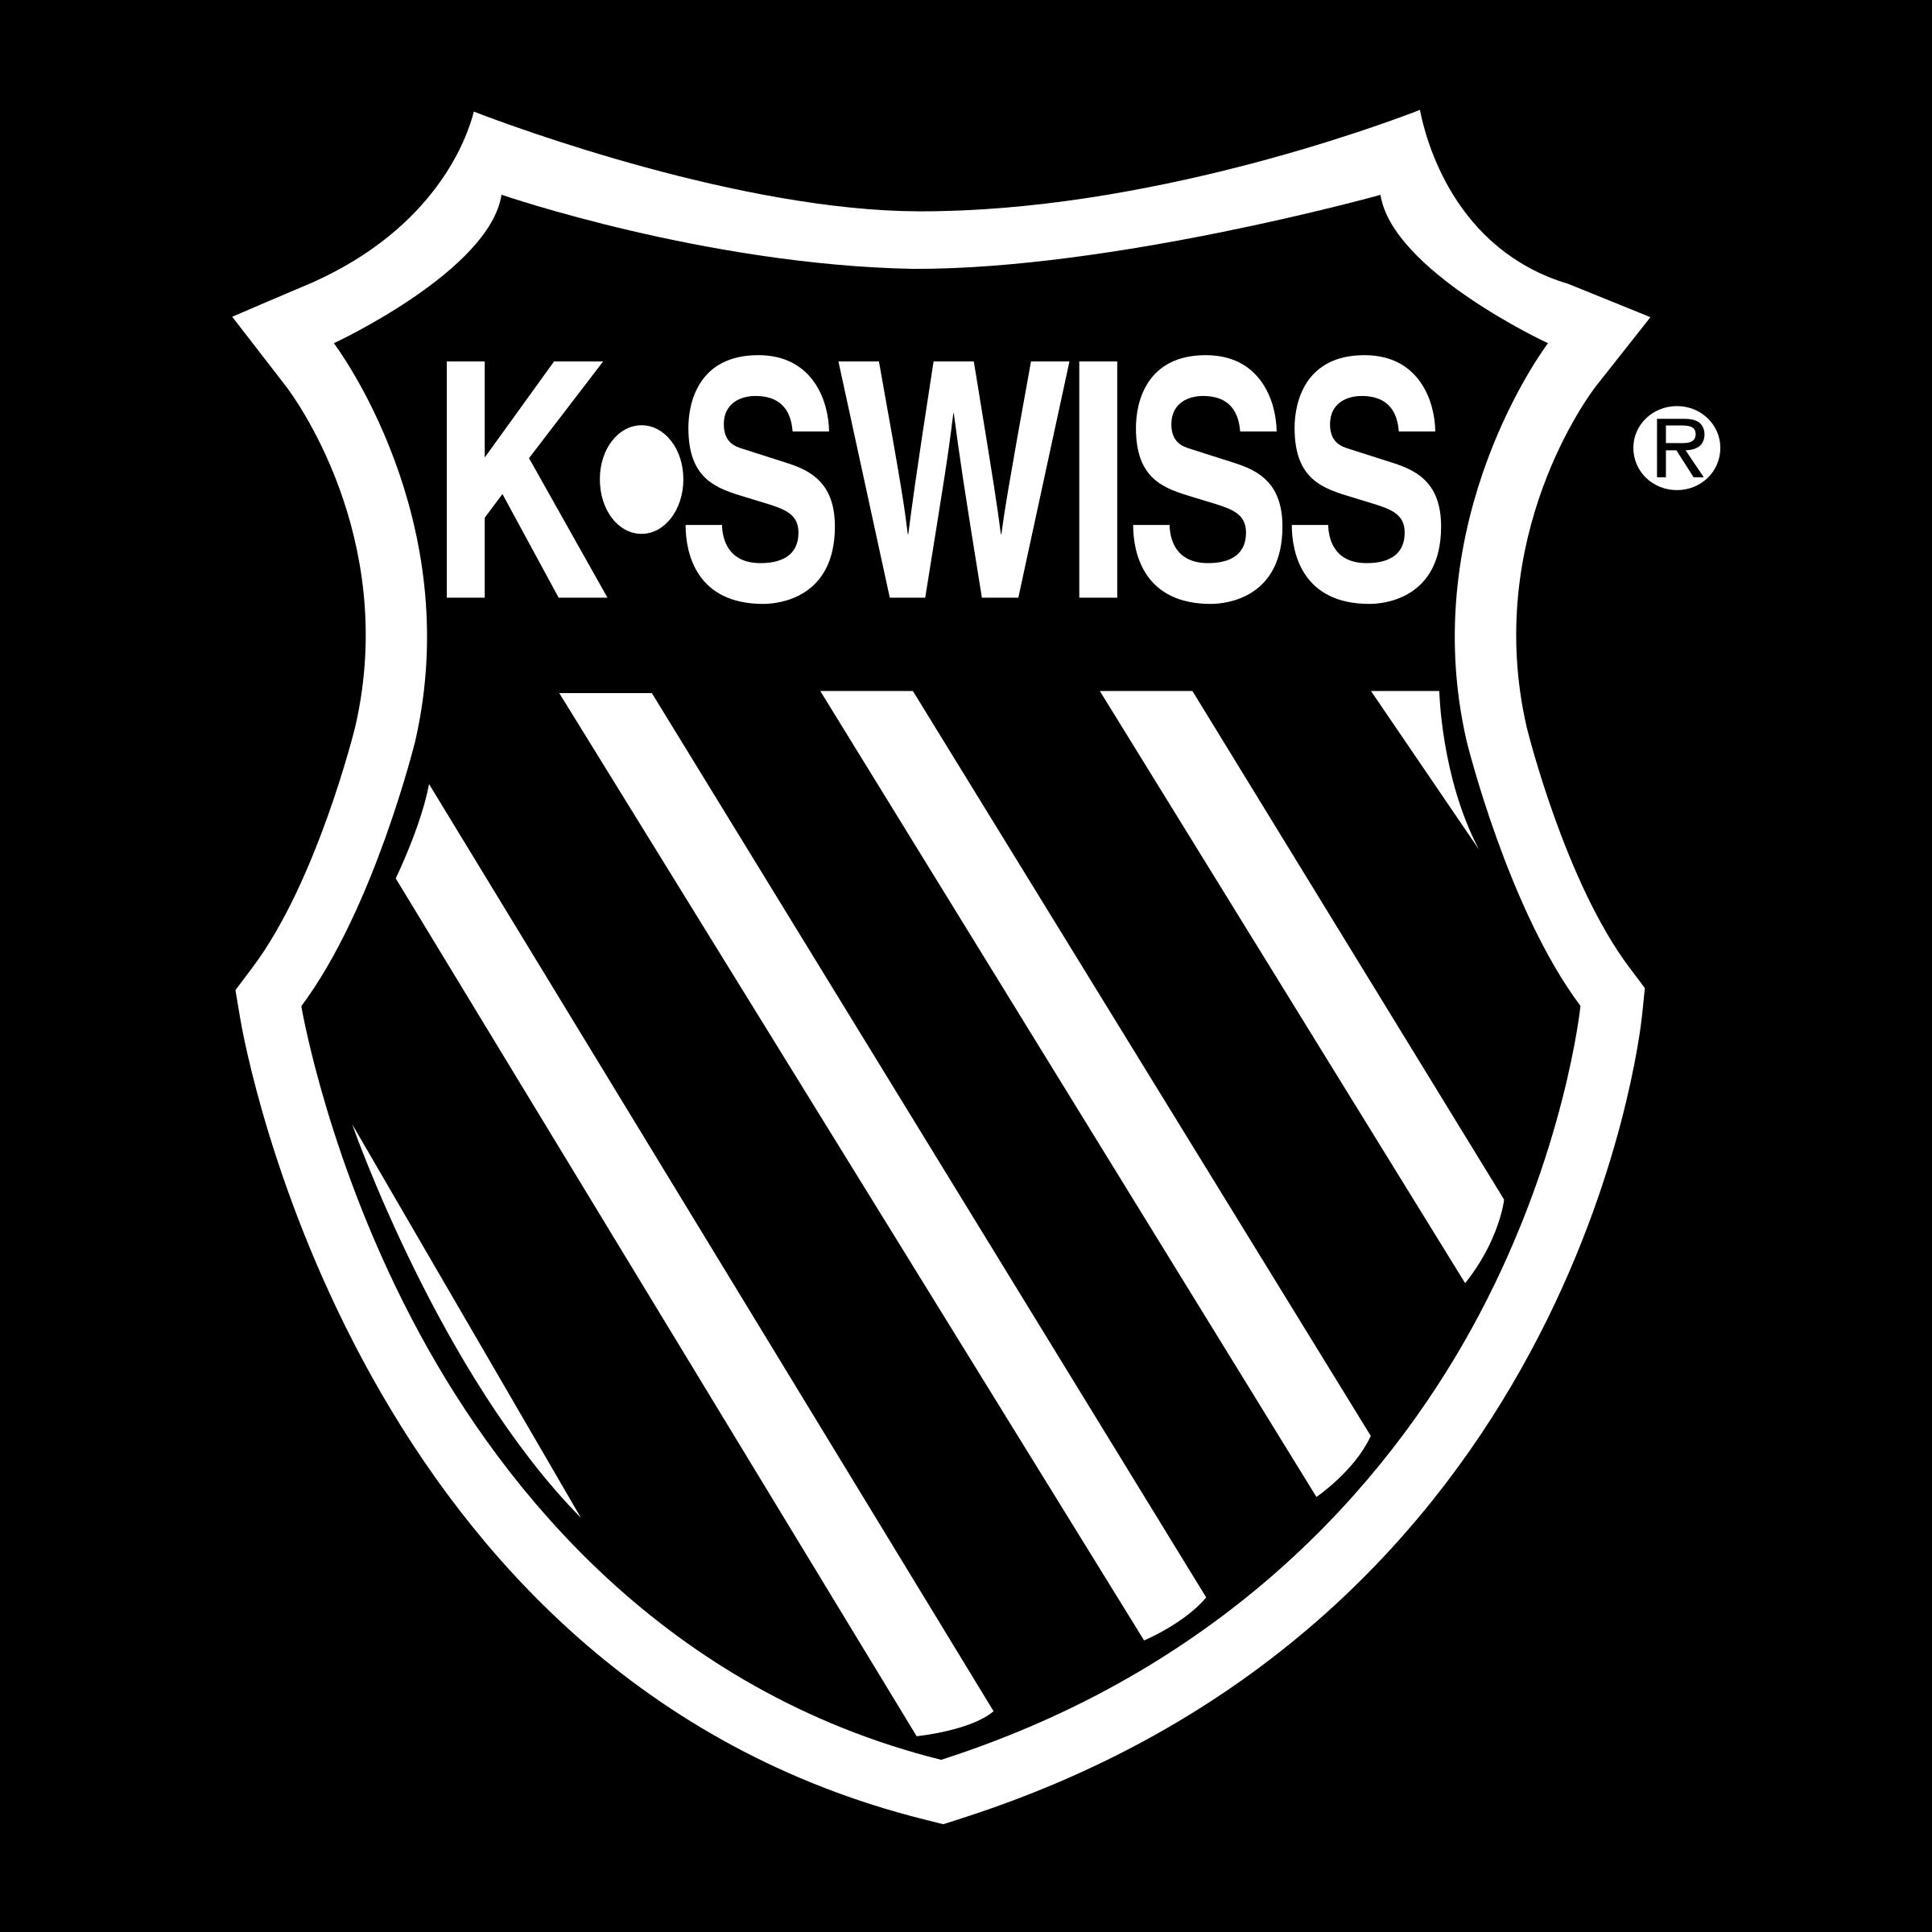 K Swiss Logo PNG Transparent & SVG Vector.